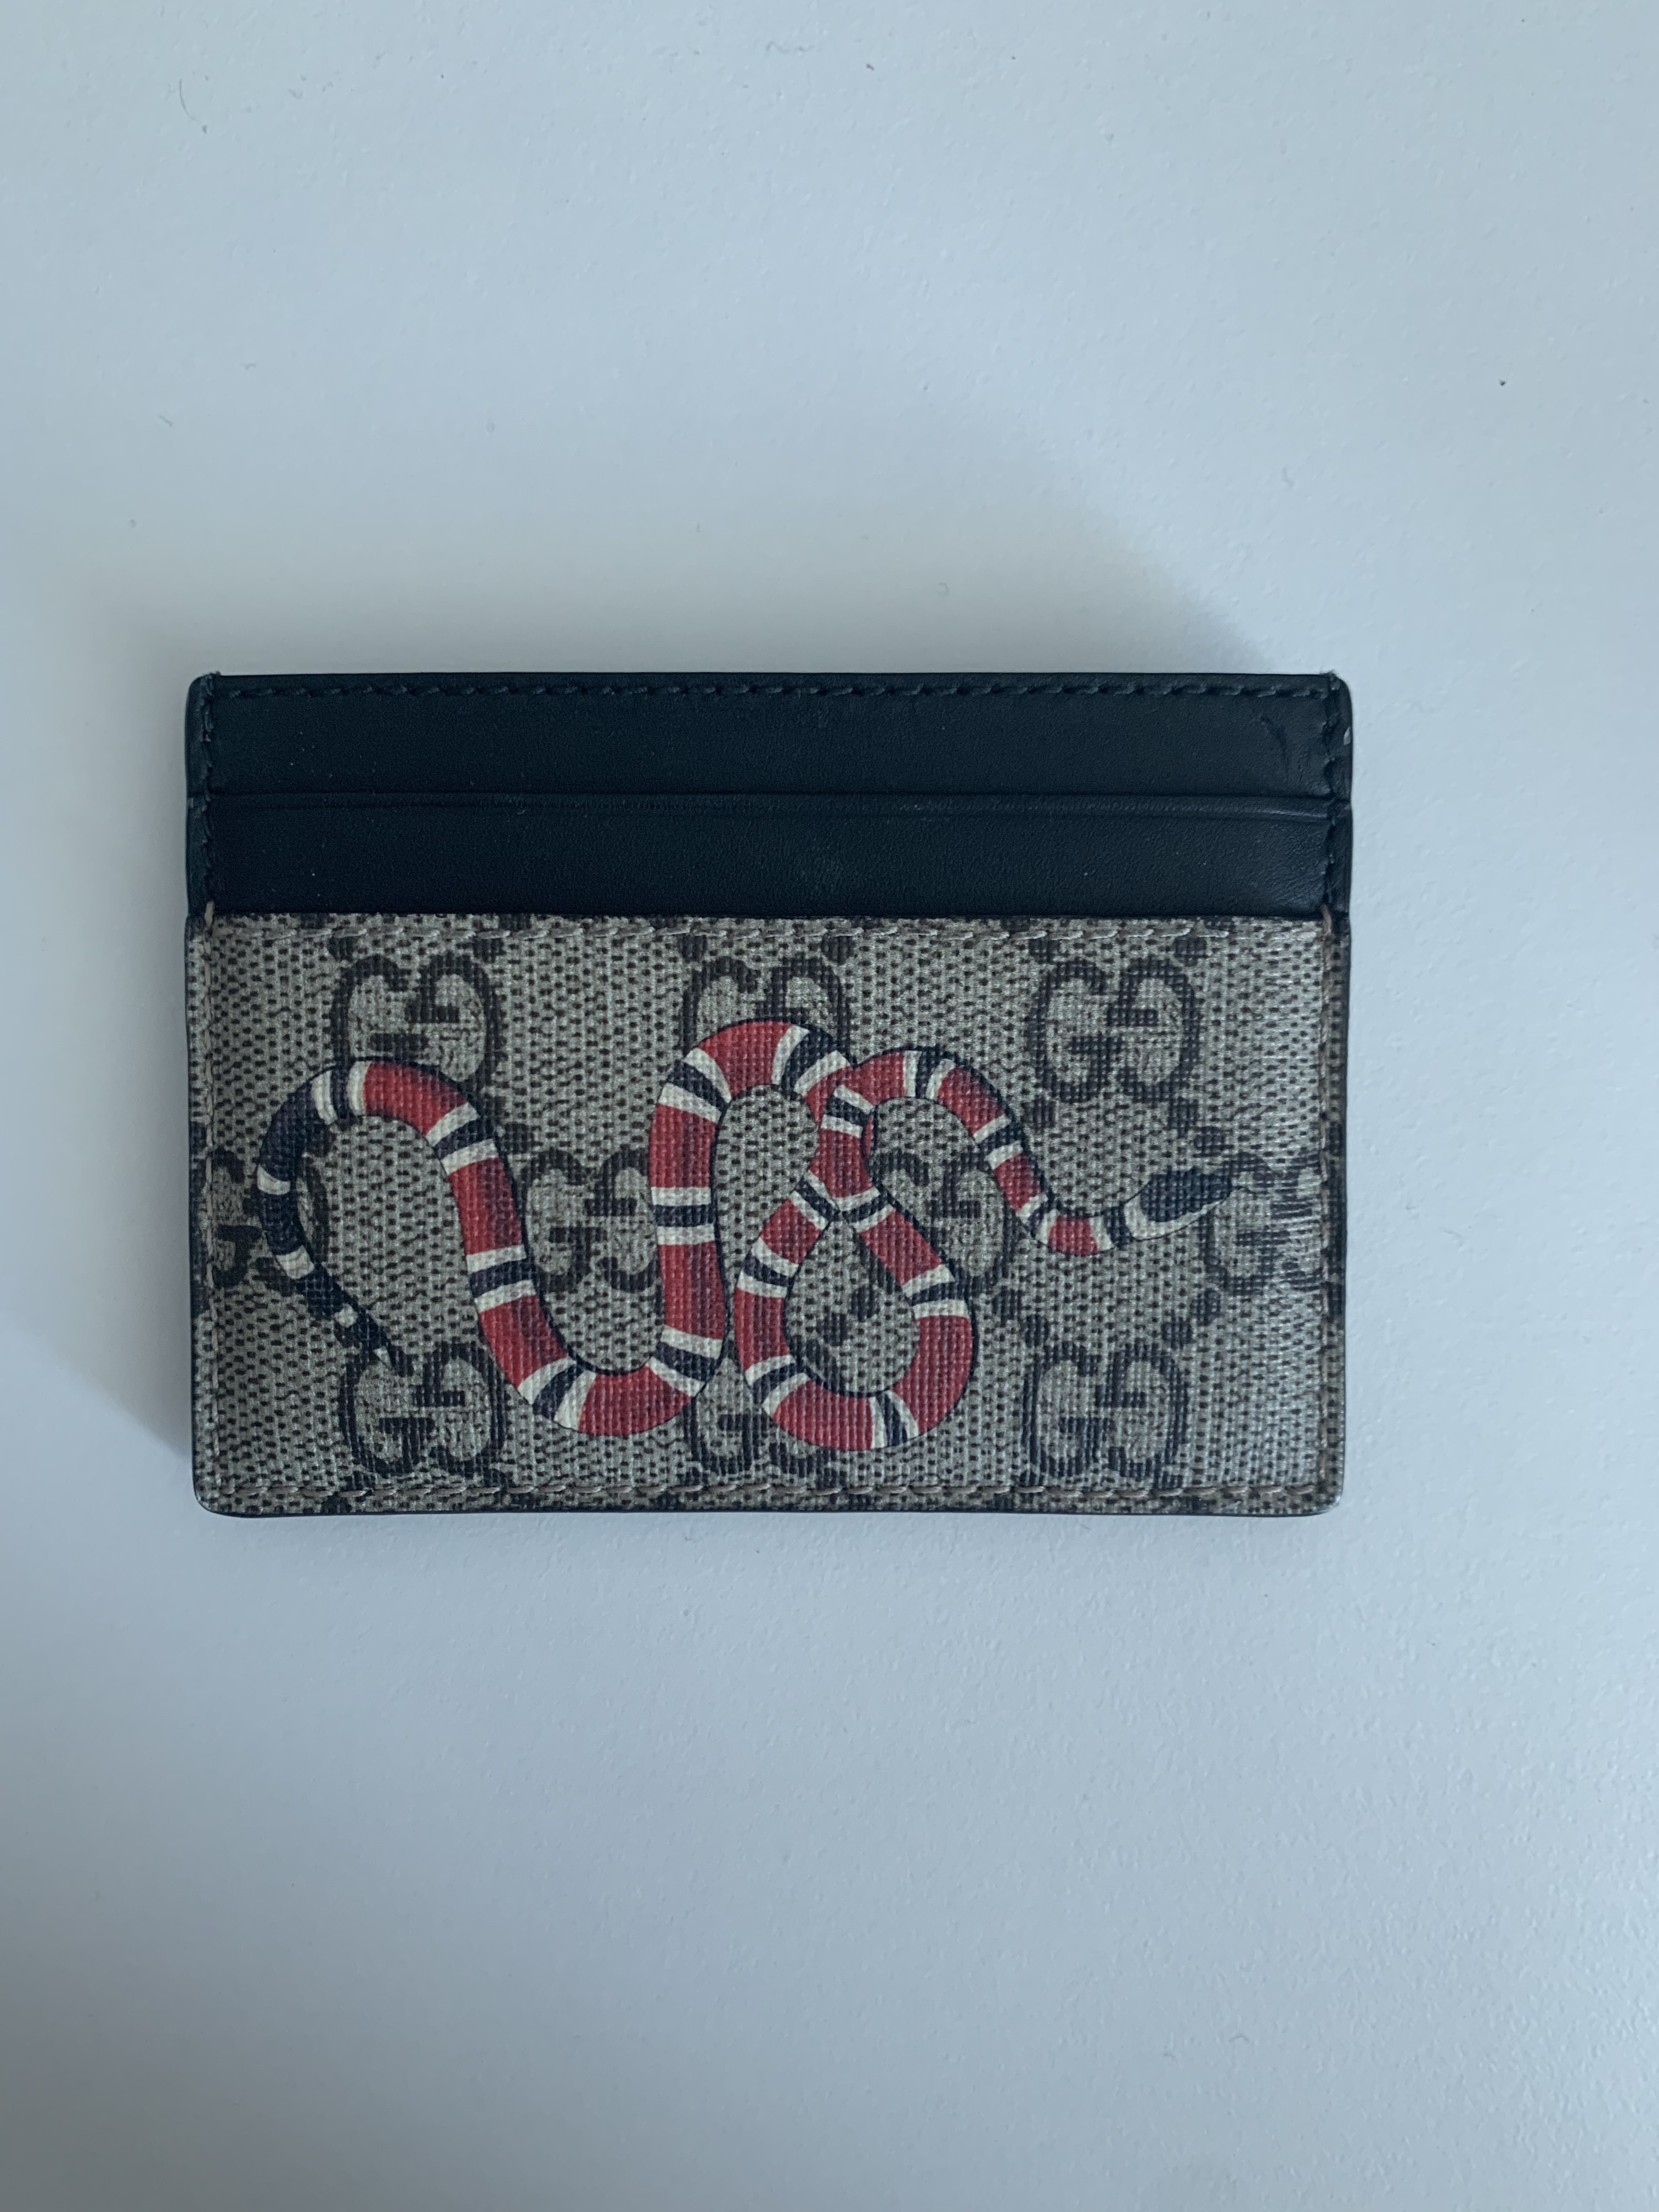 c38b6246c922 Gucci Snake Print Gucci Cardholder (case) | Grailed